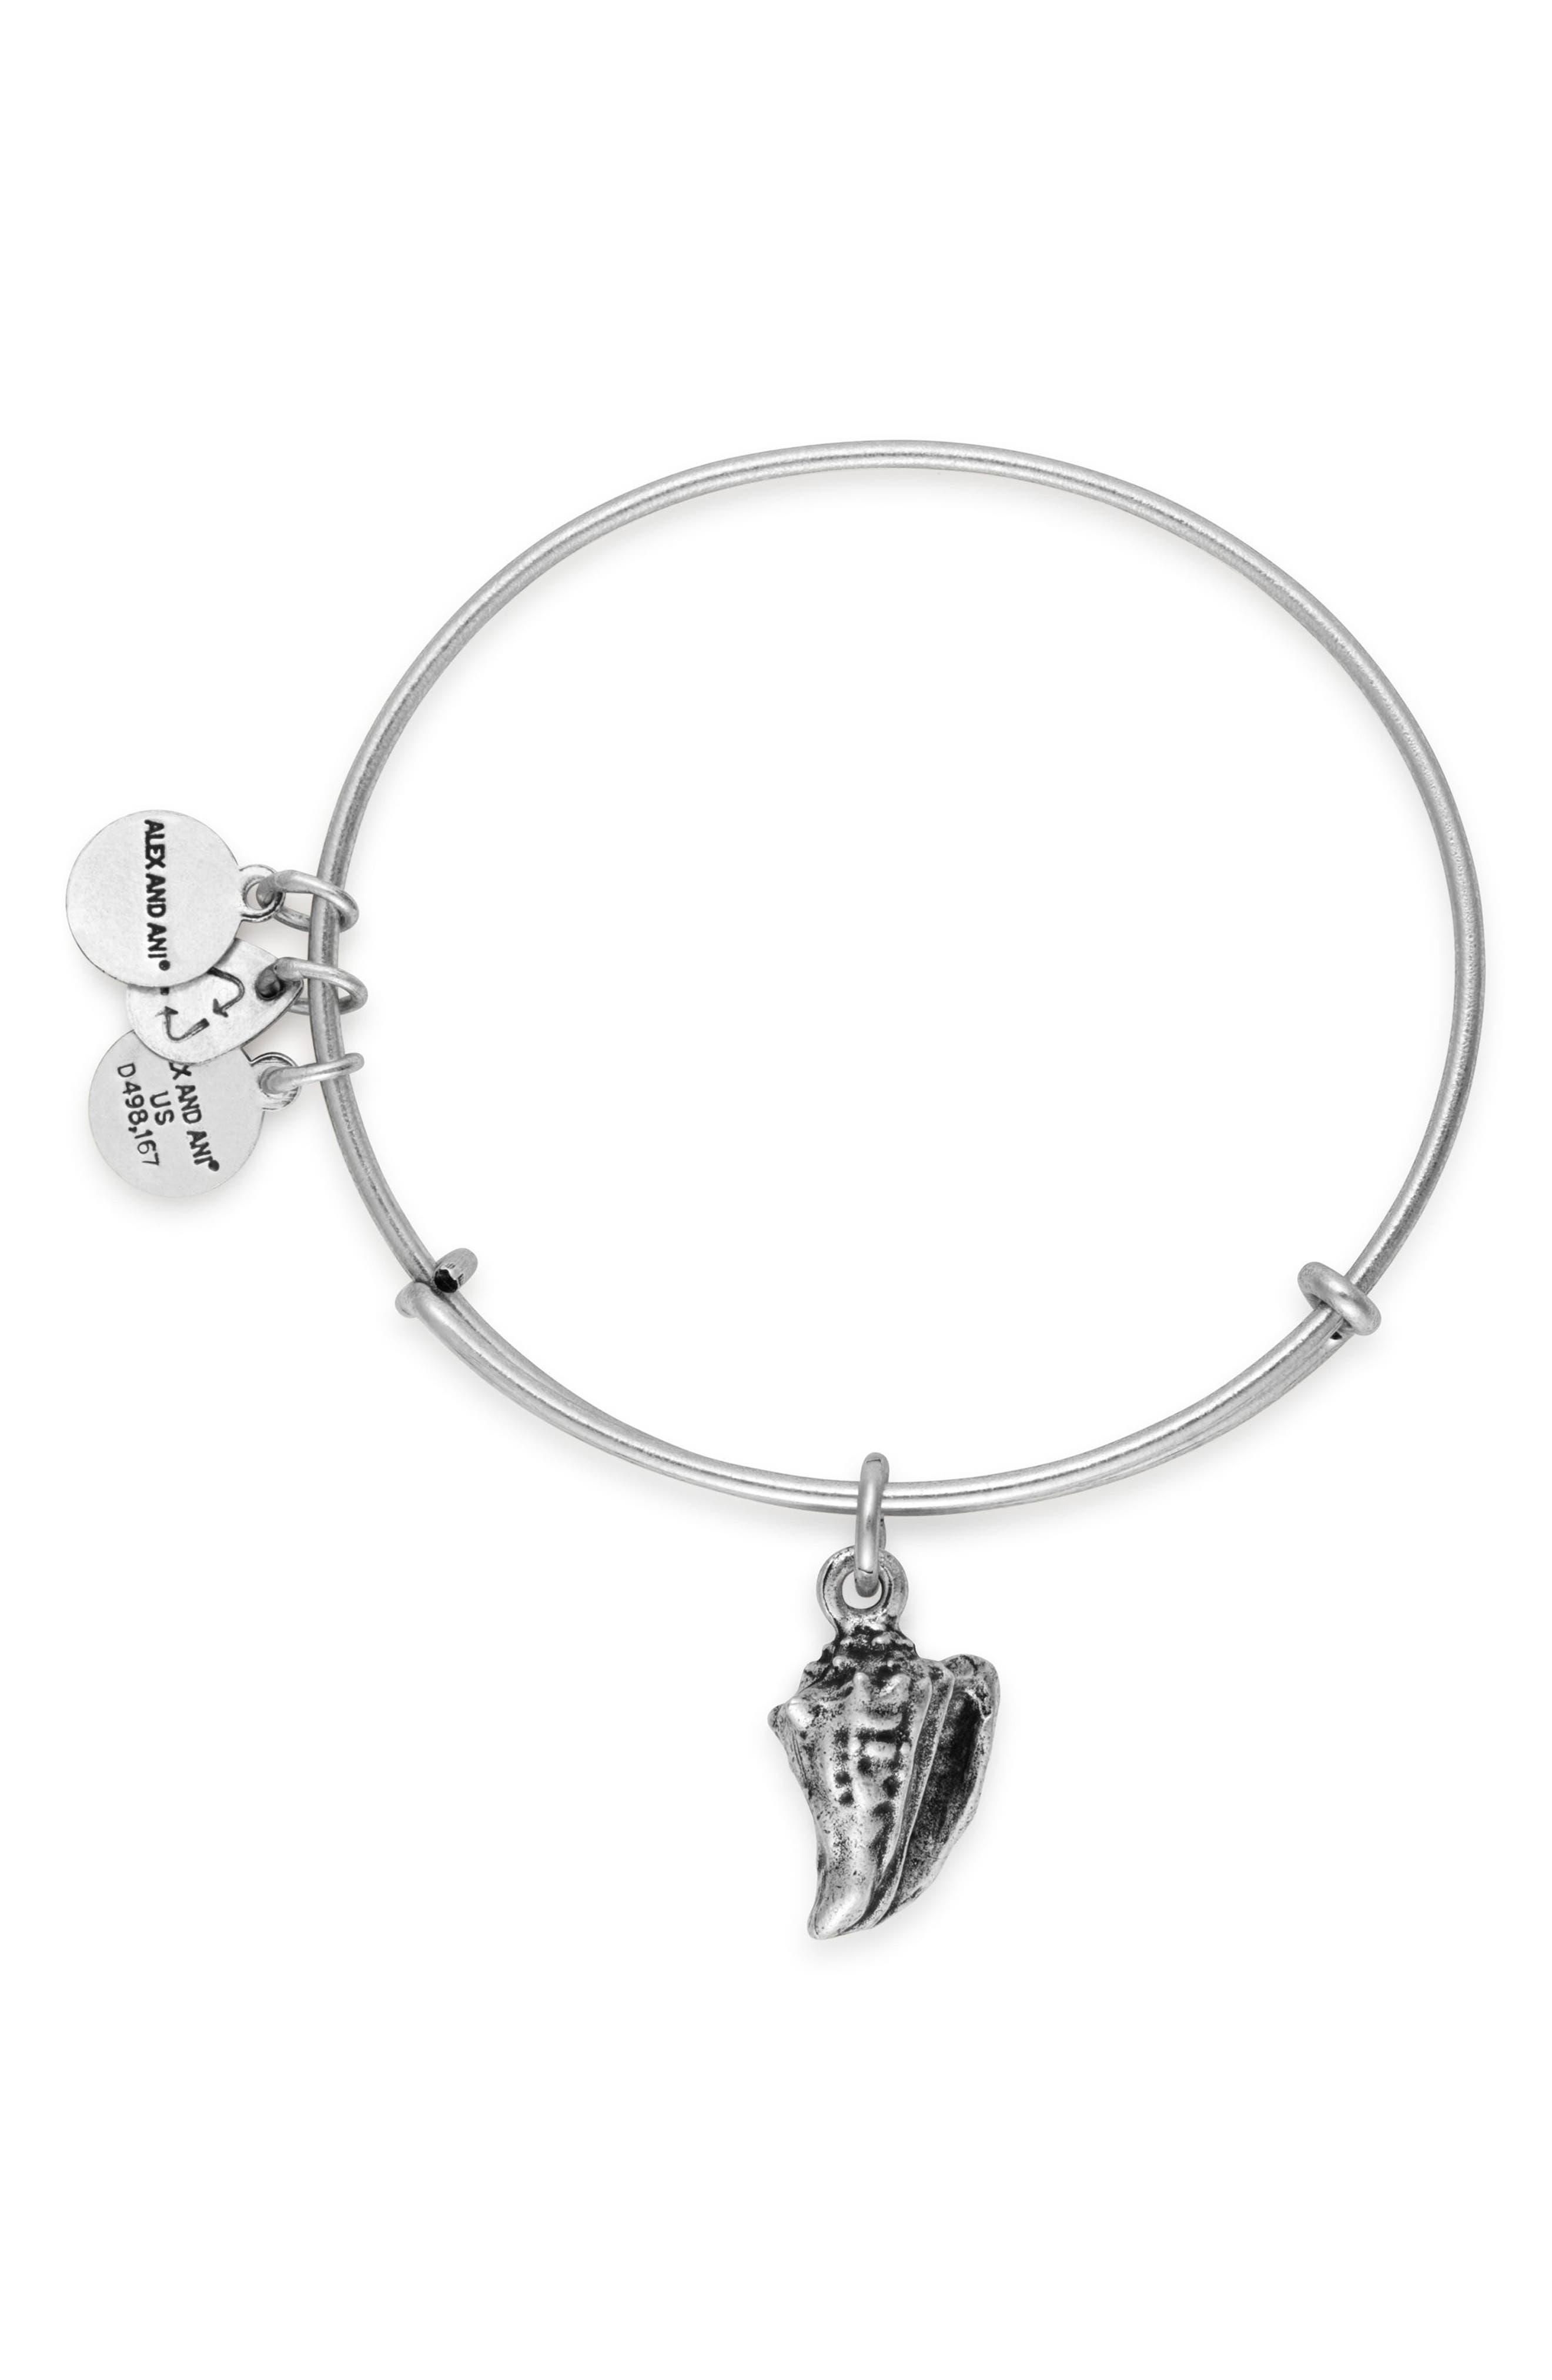 Conch Shell Expandable Charm Bracelet,                             Alternate thumbnail 2, color,                             040